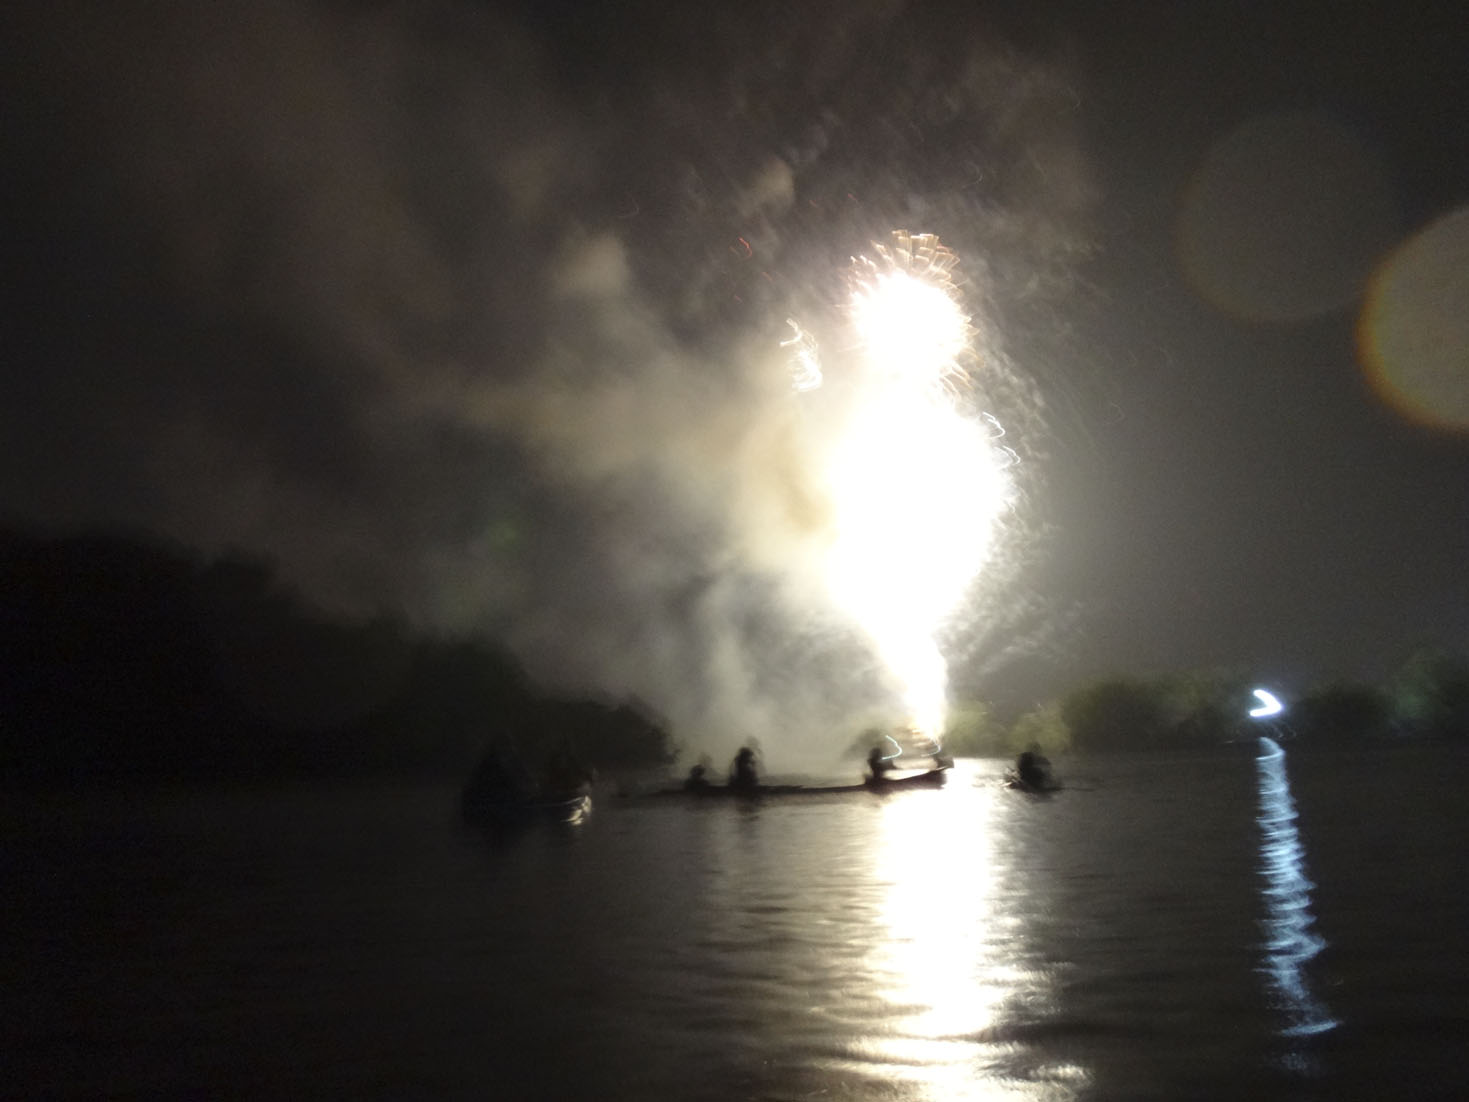 Hackensack River Canoe and Kayak Club – Tom Hart Photo